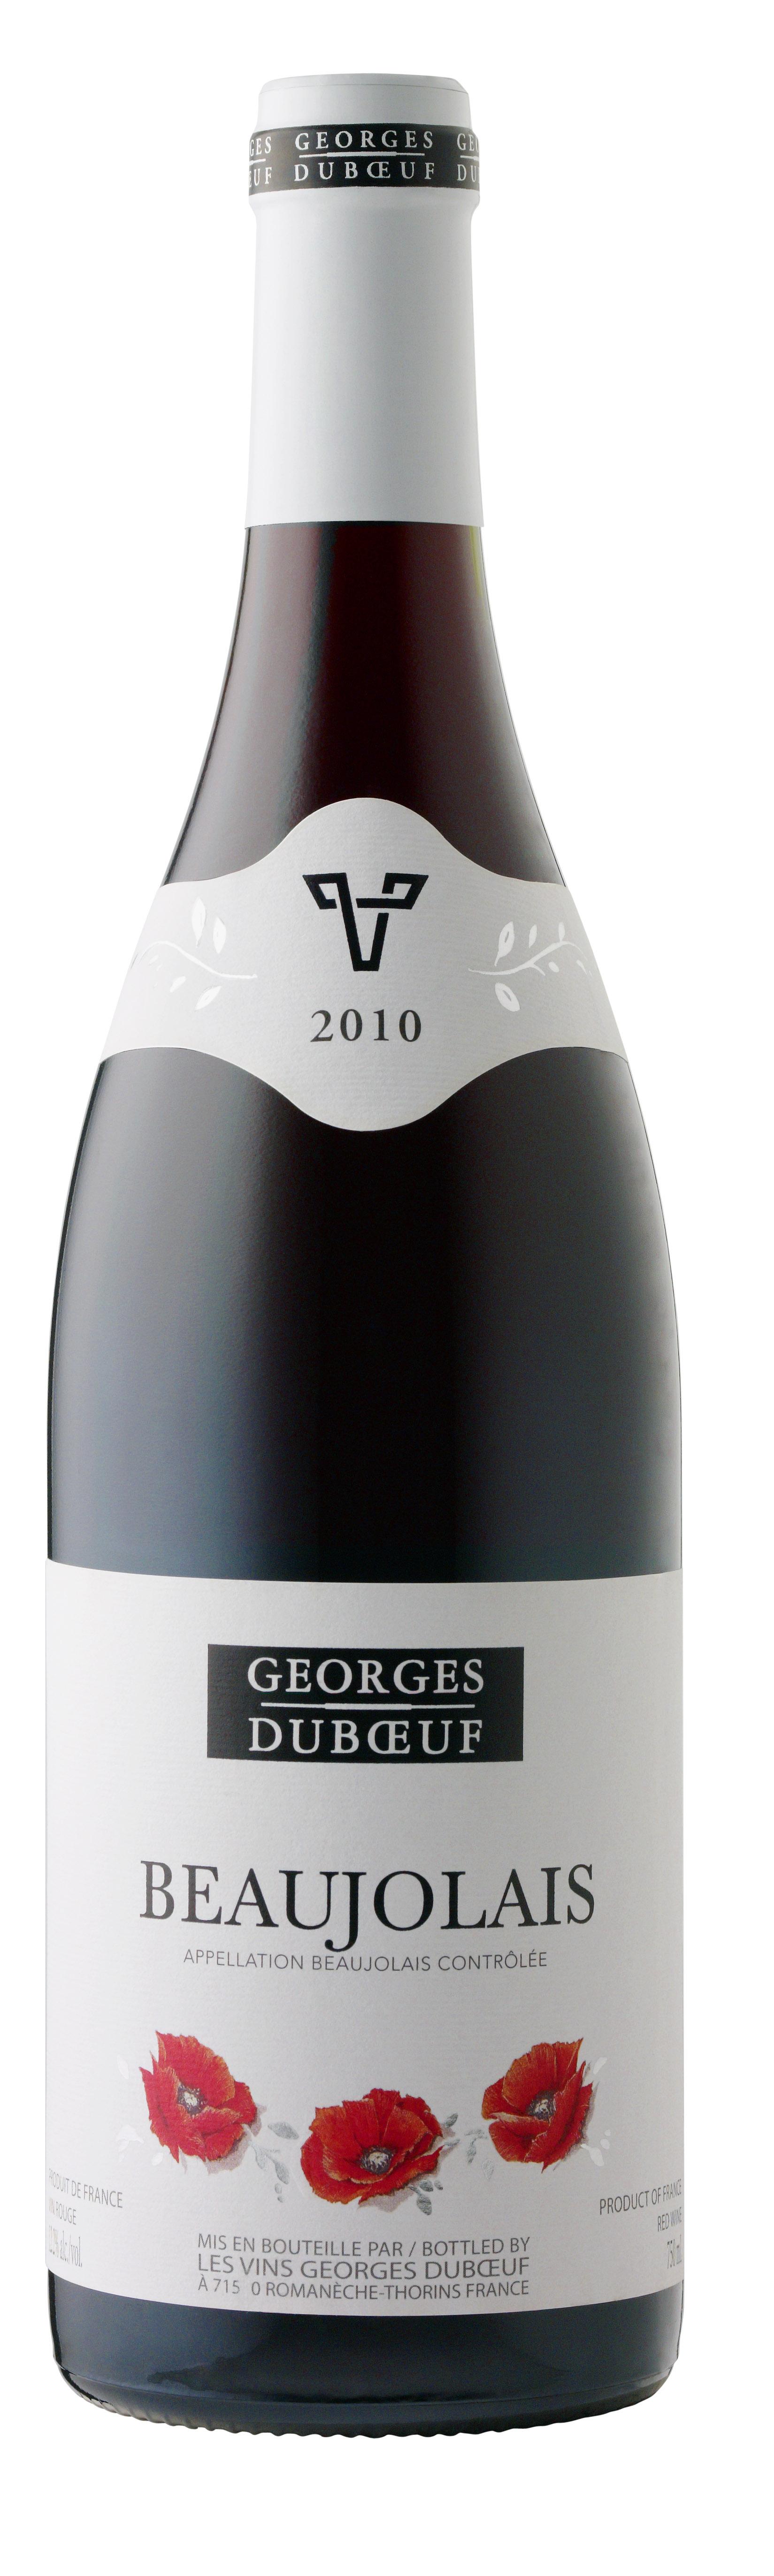 LCBO_P8_Gamay_Bottles 90775 GD Beaujolais EDIT.jpg